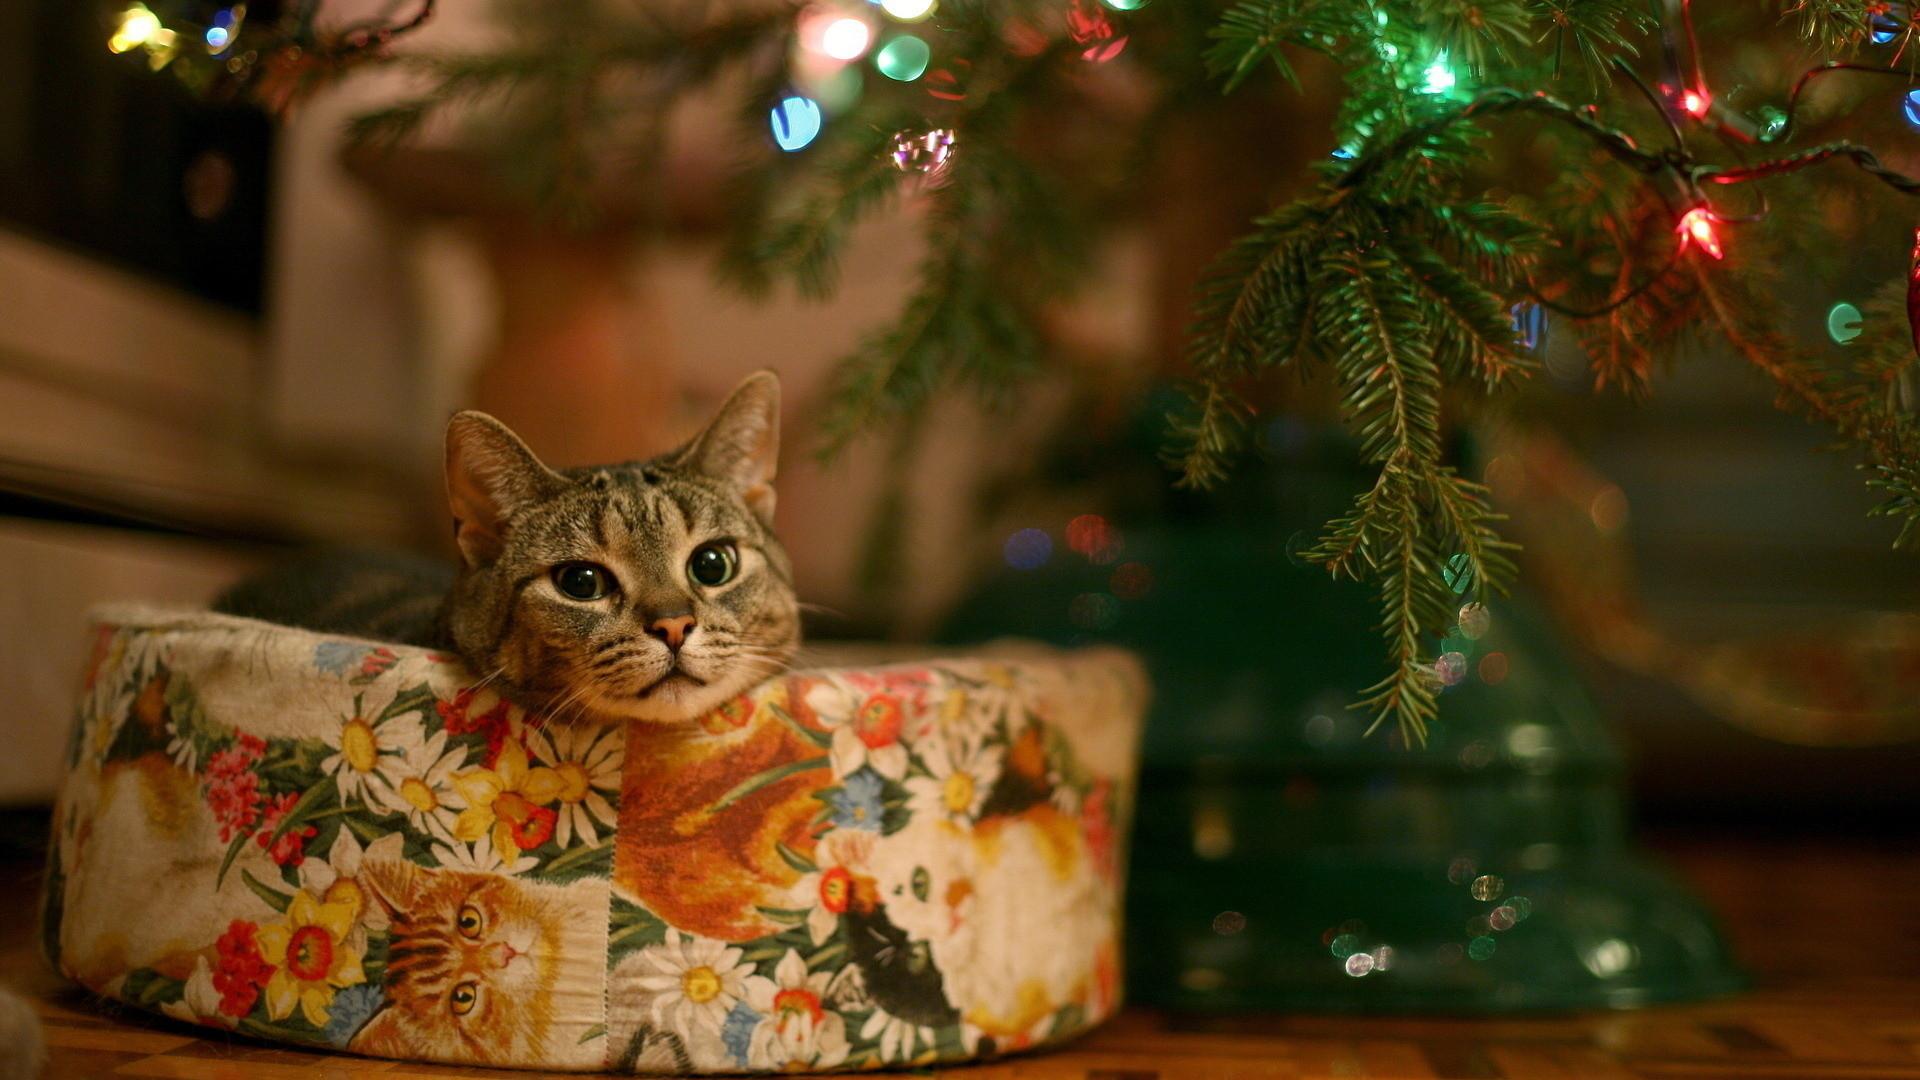 merry christmas zdjecia